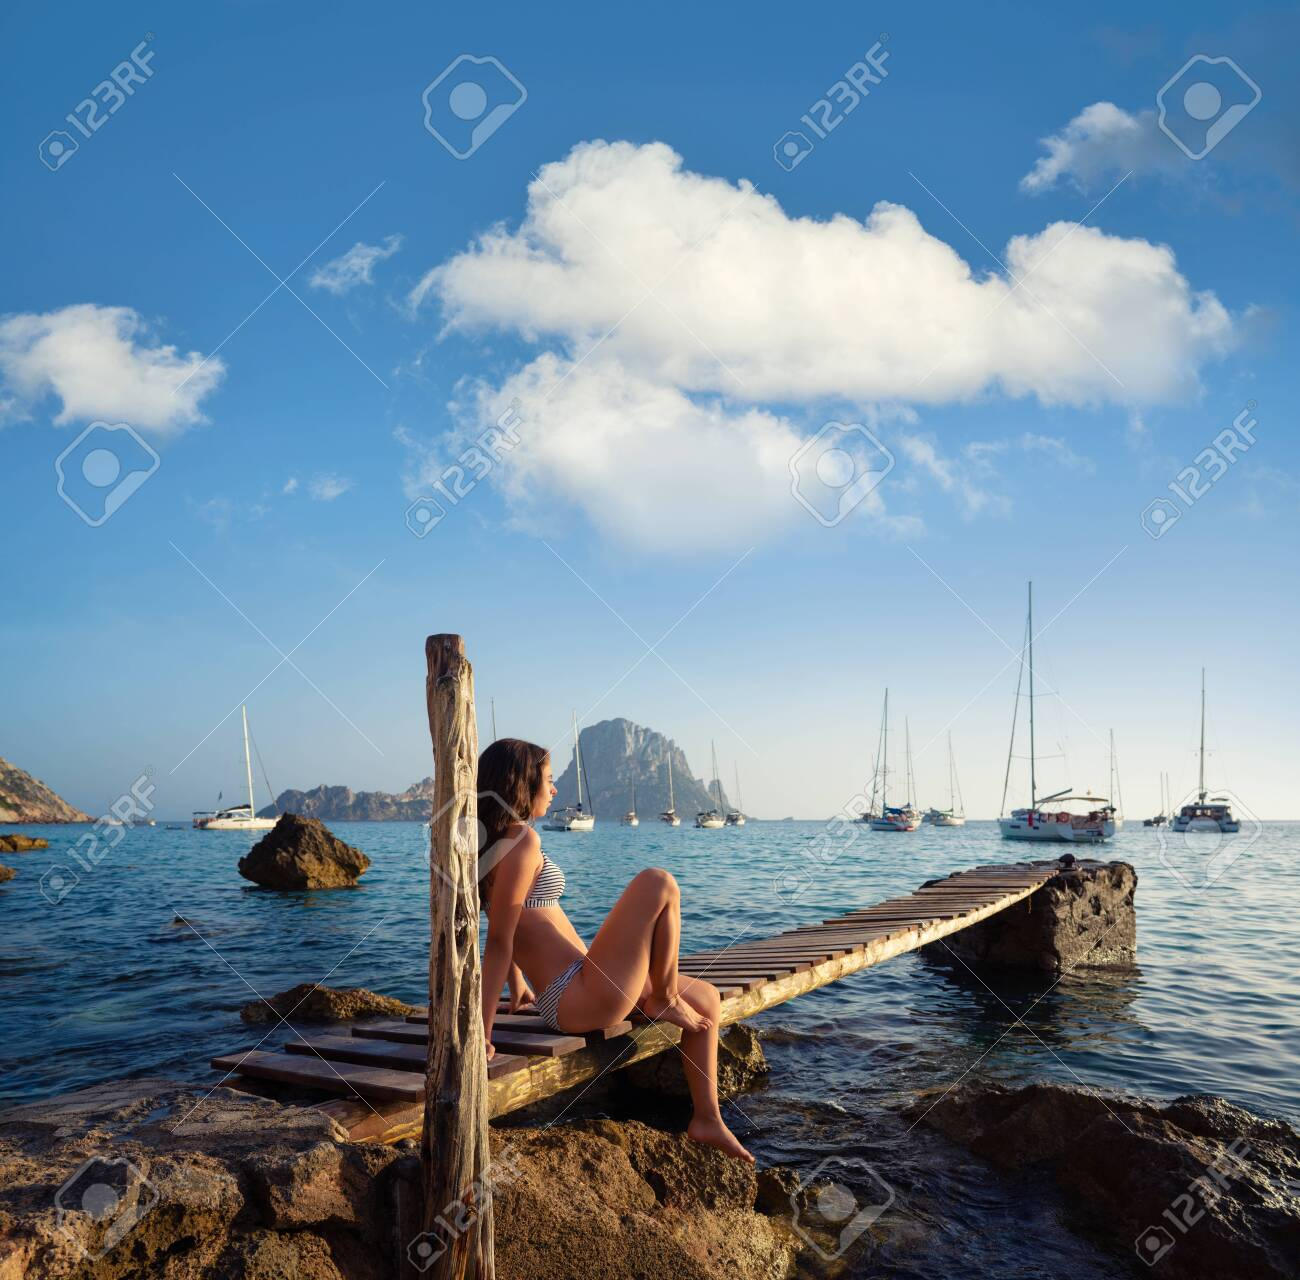 Ibiza cala d Hort girl on pier sunset Es Vedra islet Balearic Islands - 127426865